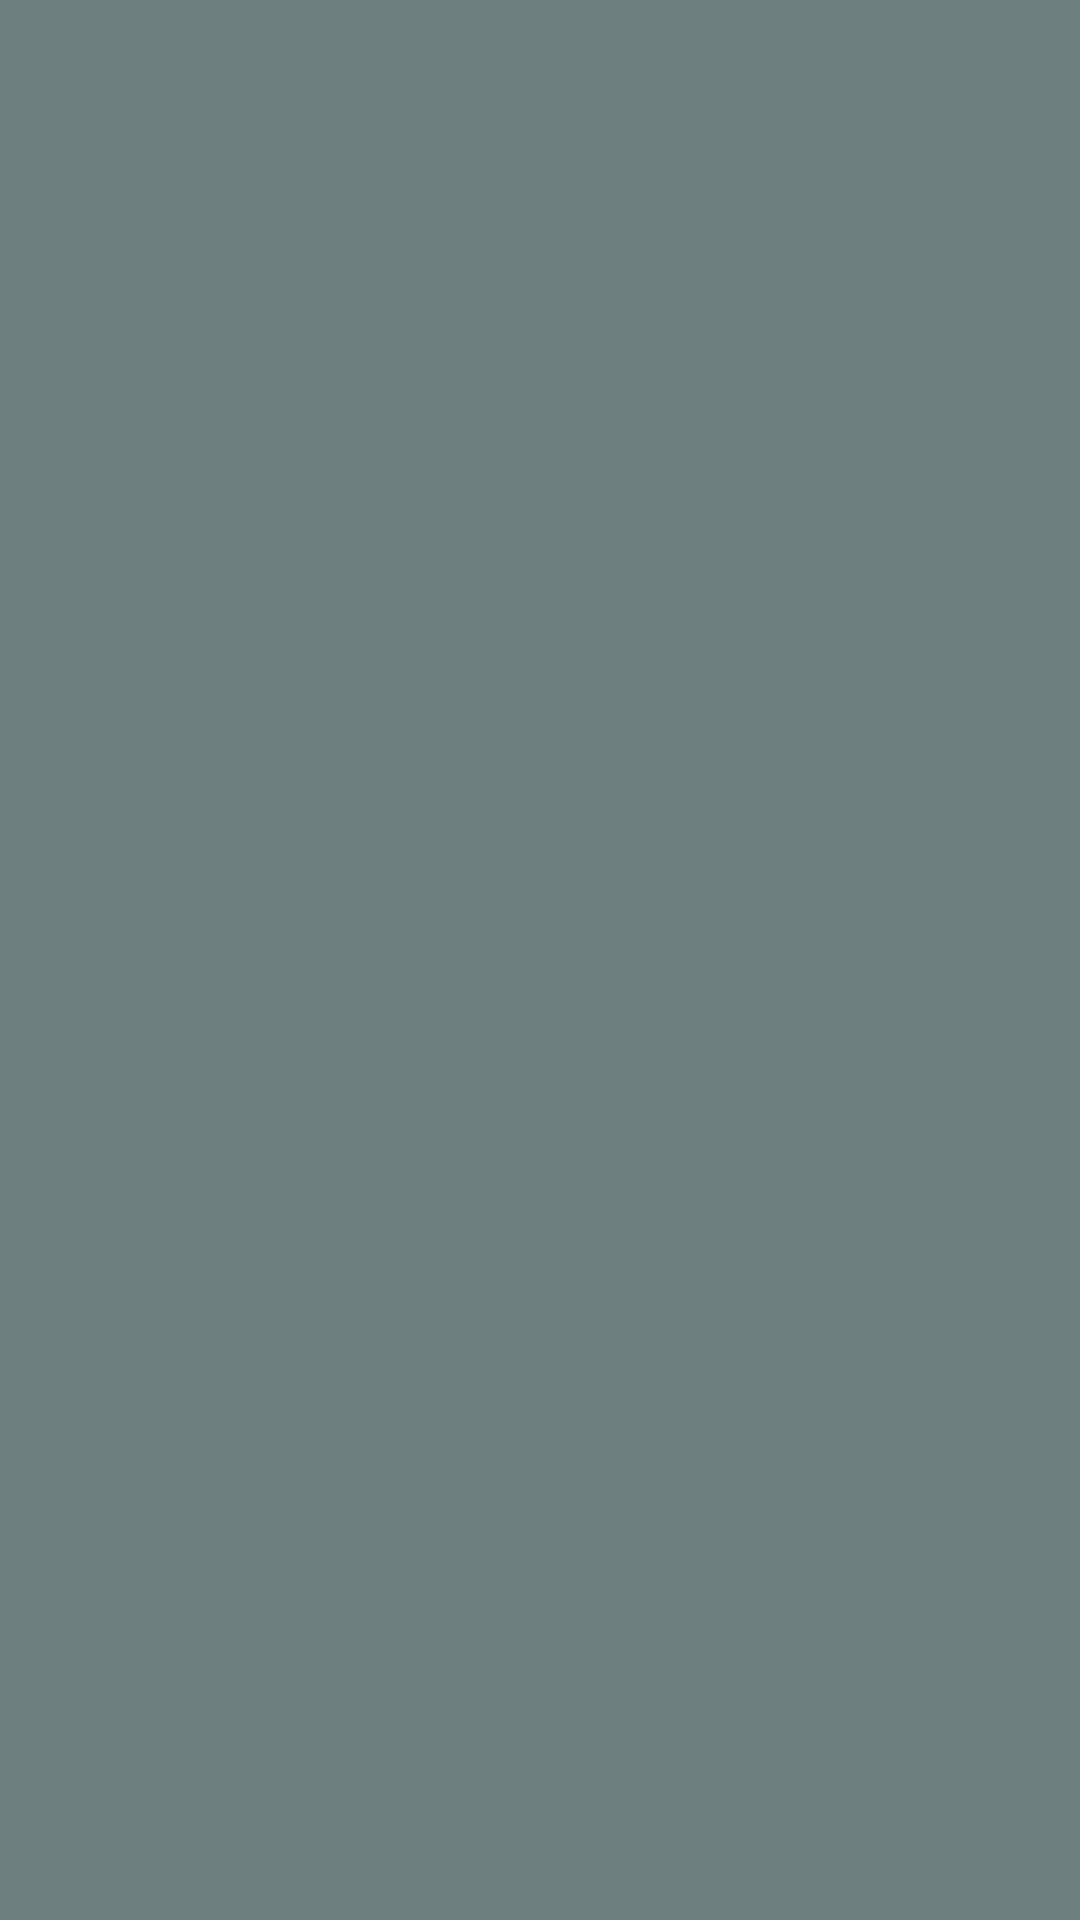 1080x1920 AuroMetalSaurus Solid Color Background